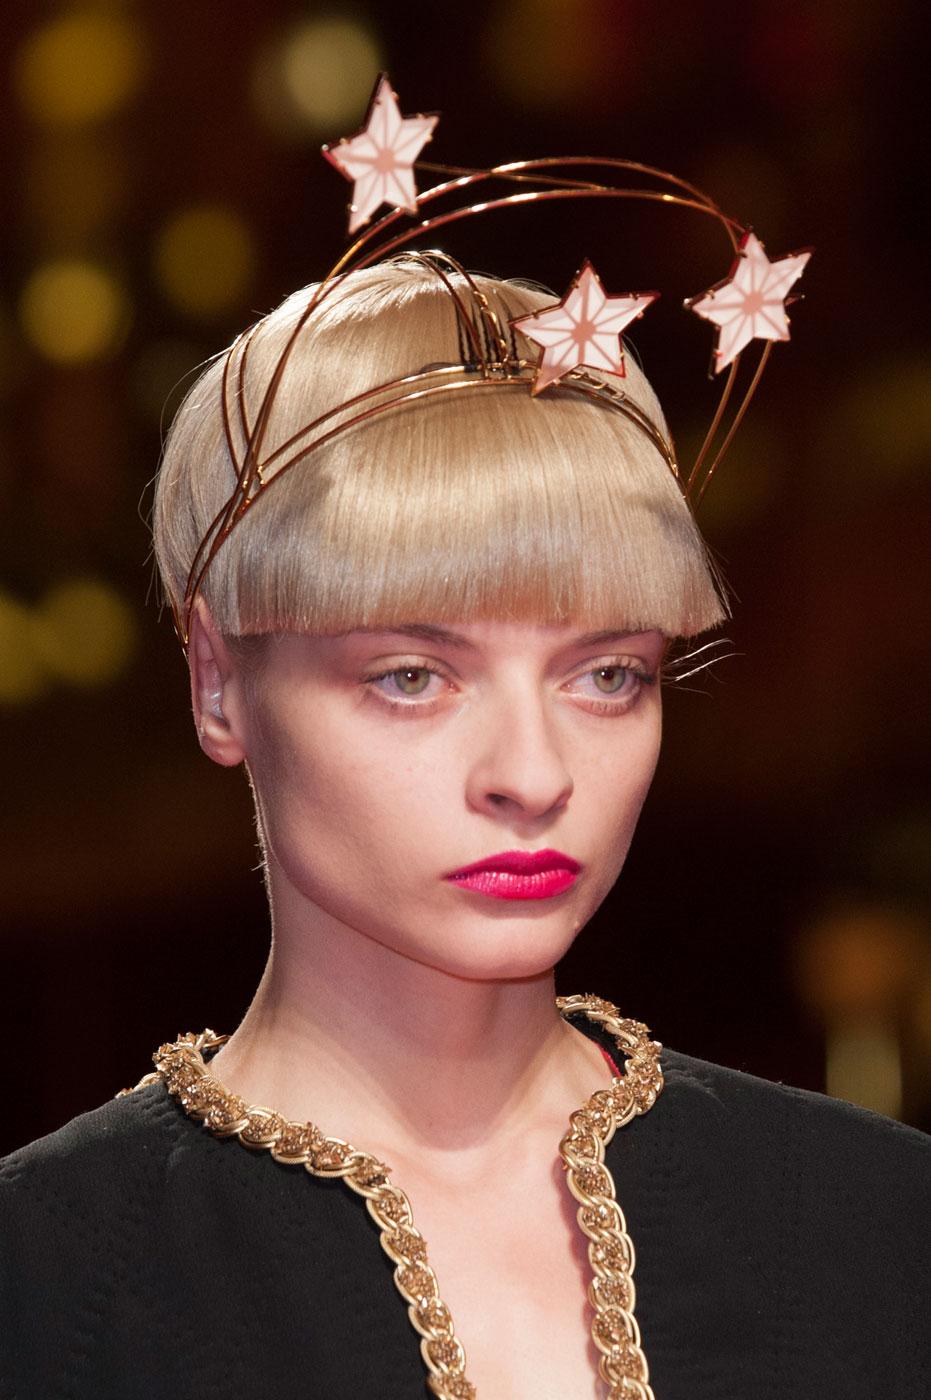 Schiaparelli-fashion-runway-show-close-ups-haute-couture-paris-spring-summer-2015-the-impression-14